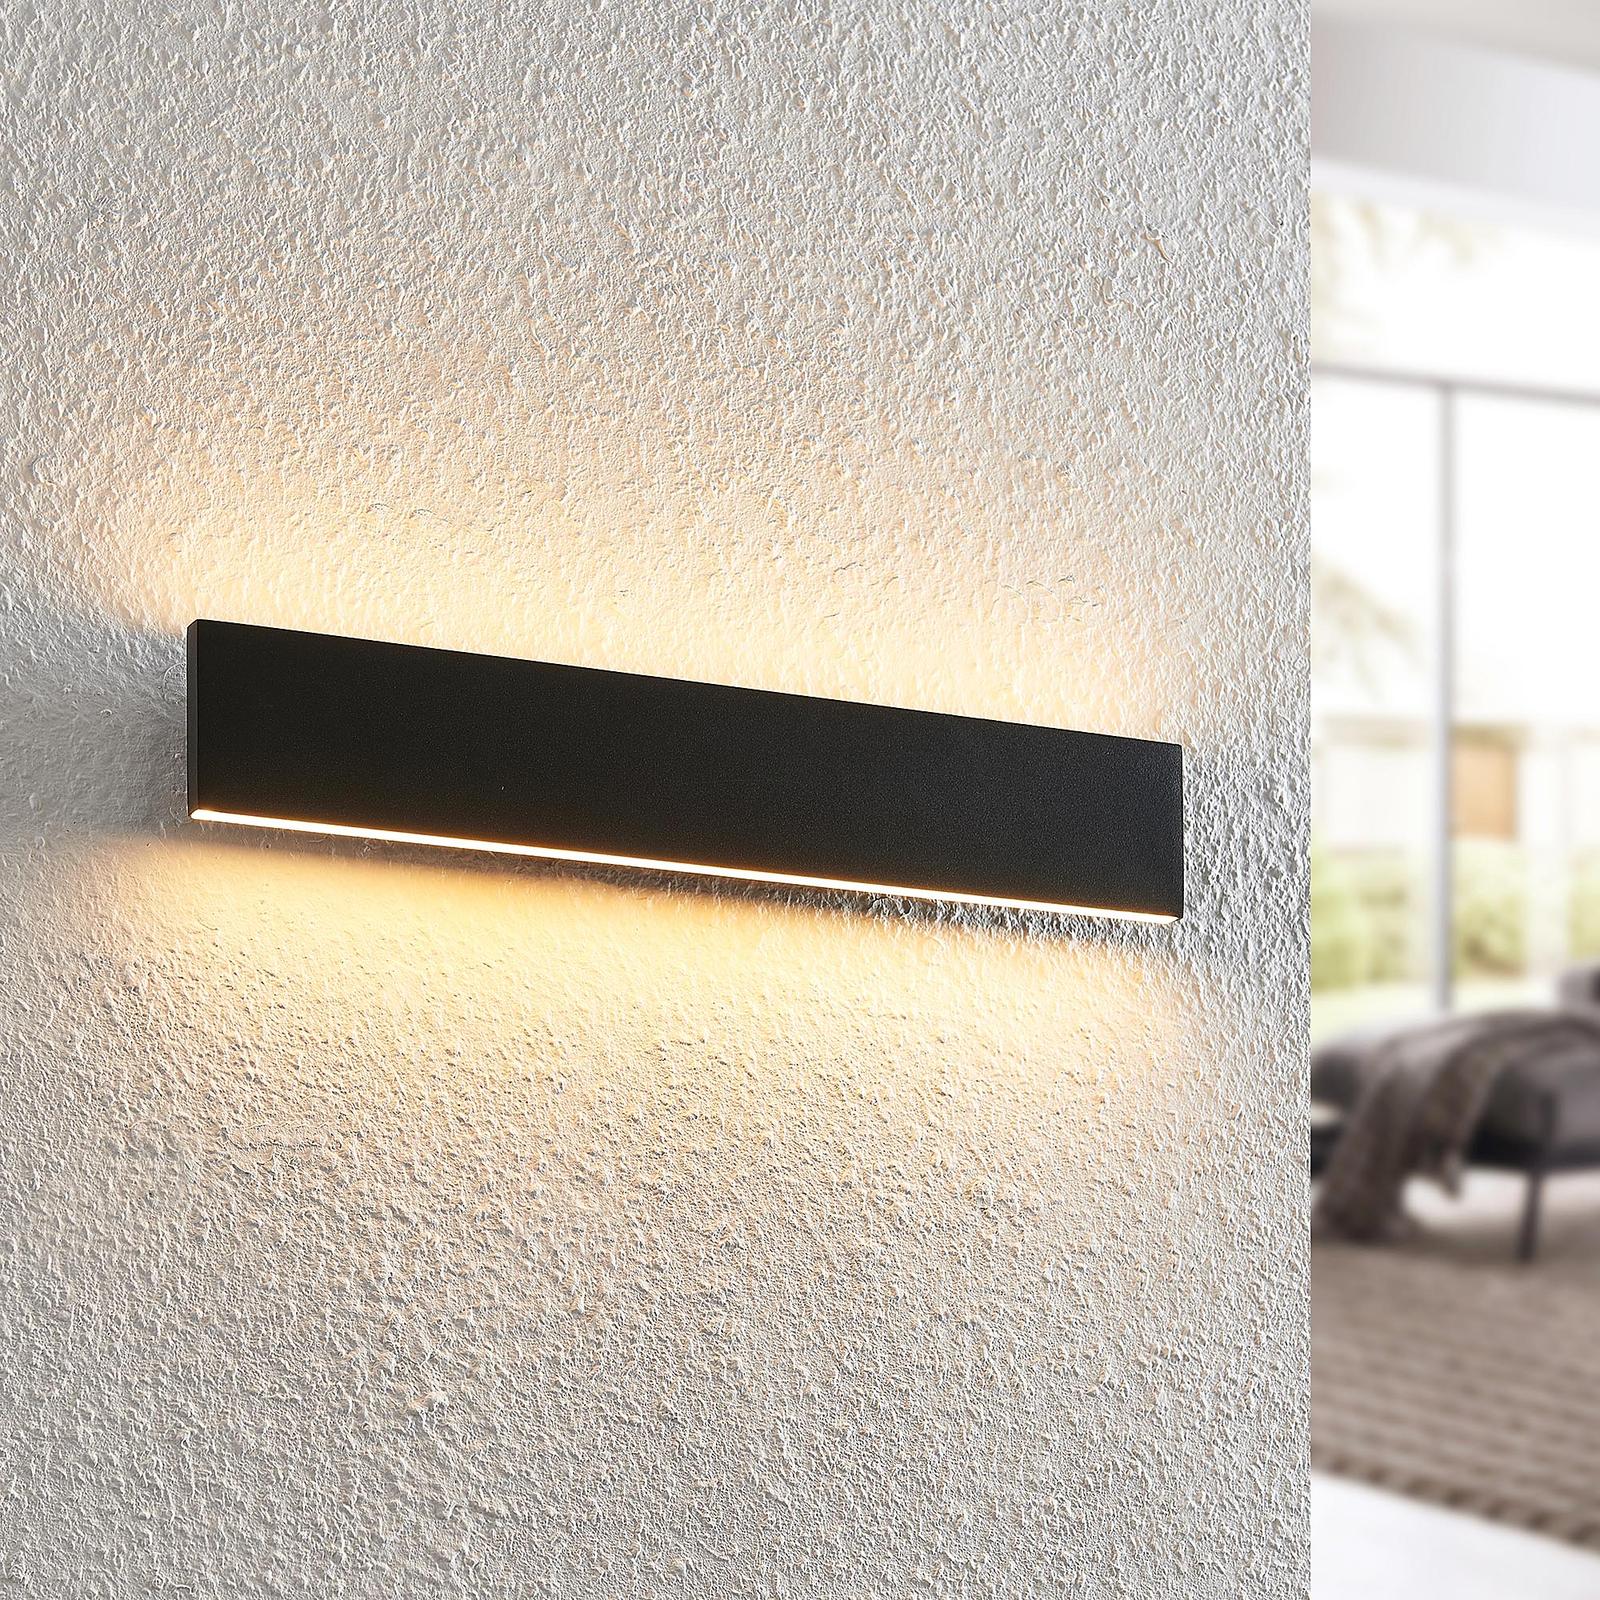 Lindby Ignazia LED-Wandleuchte, 47 cm, schwarz